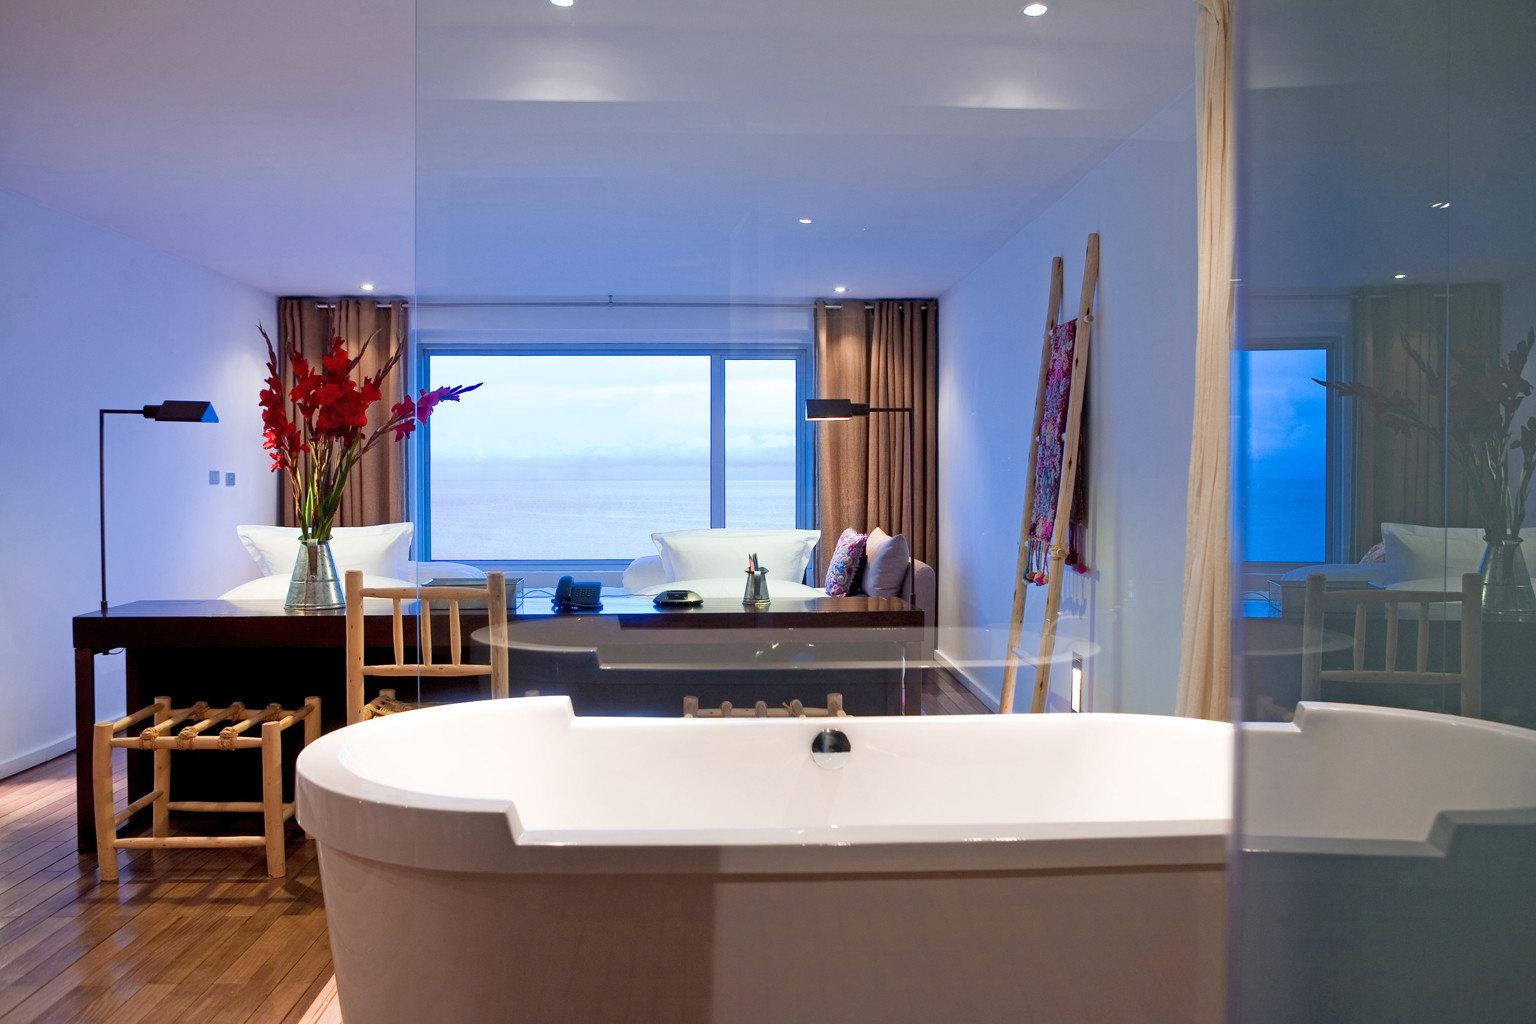 Bath Lodge Modern Scenic views Waterfront property Suite living room office tub bathtub